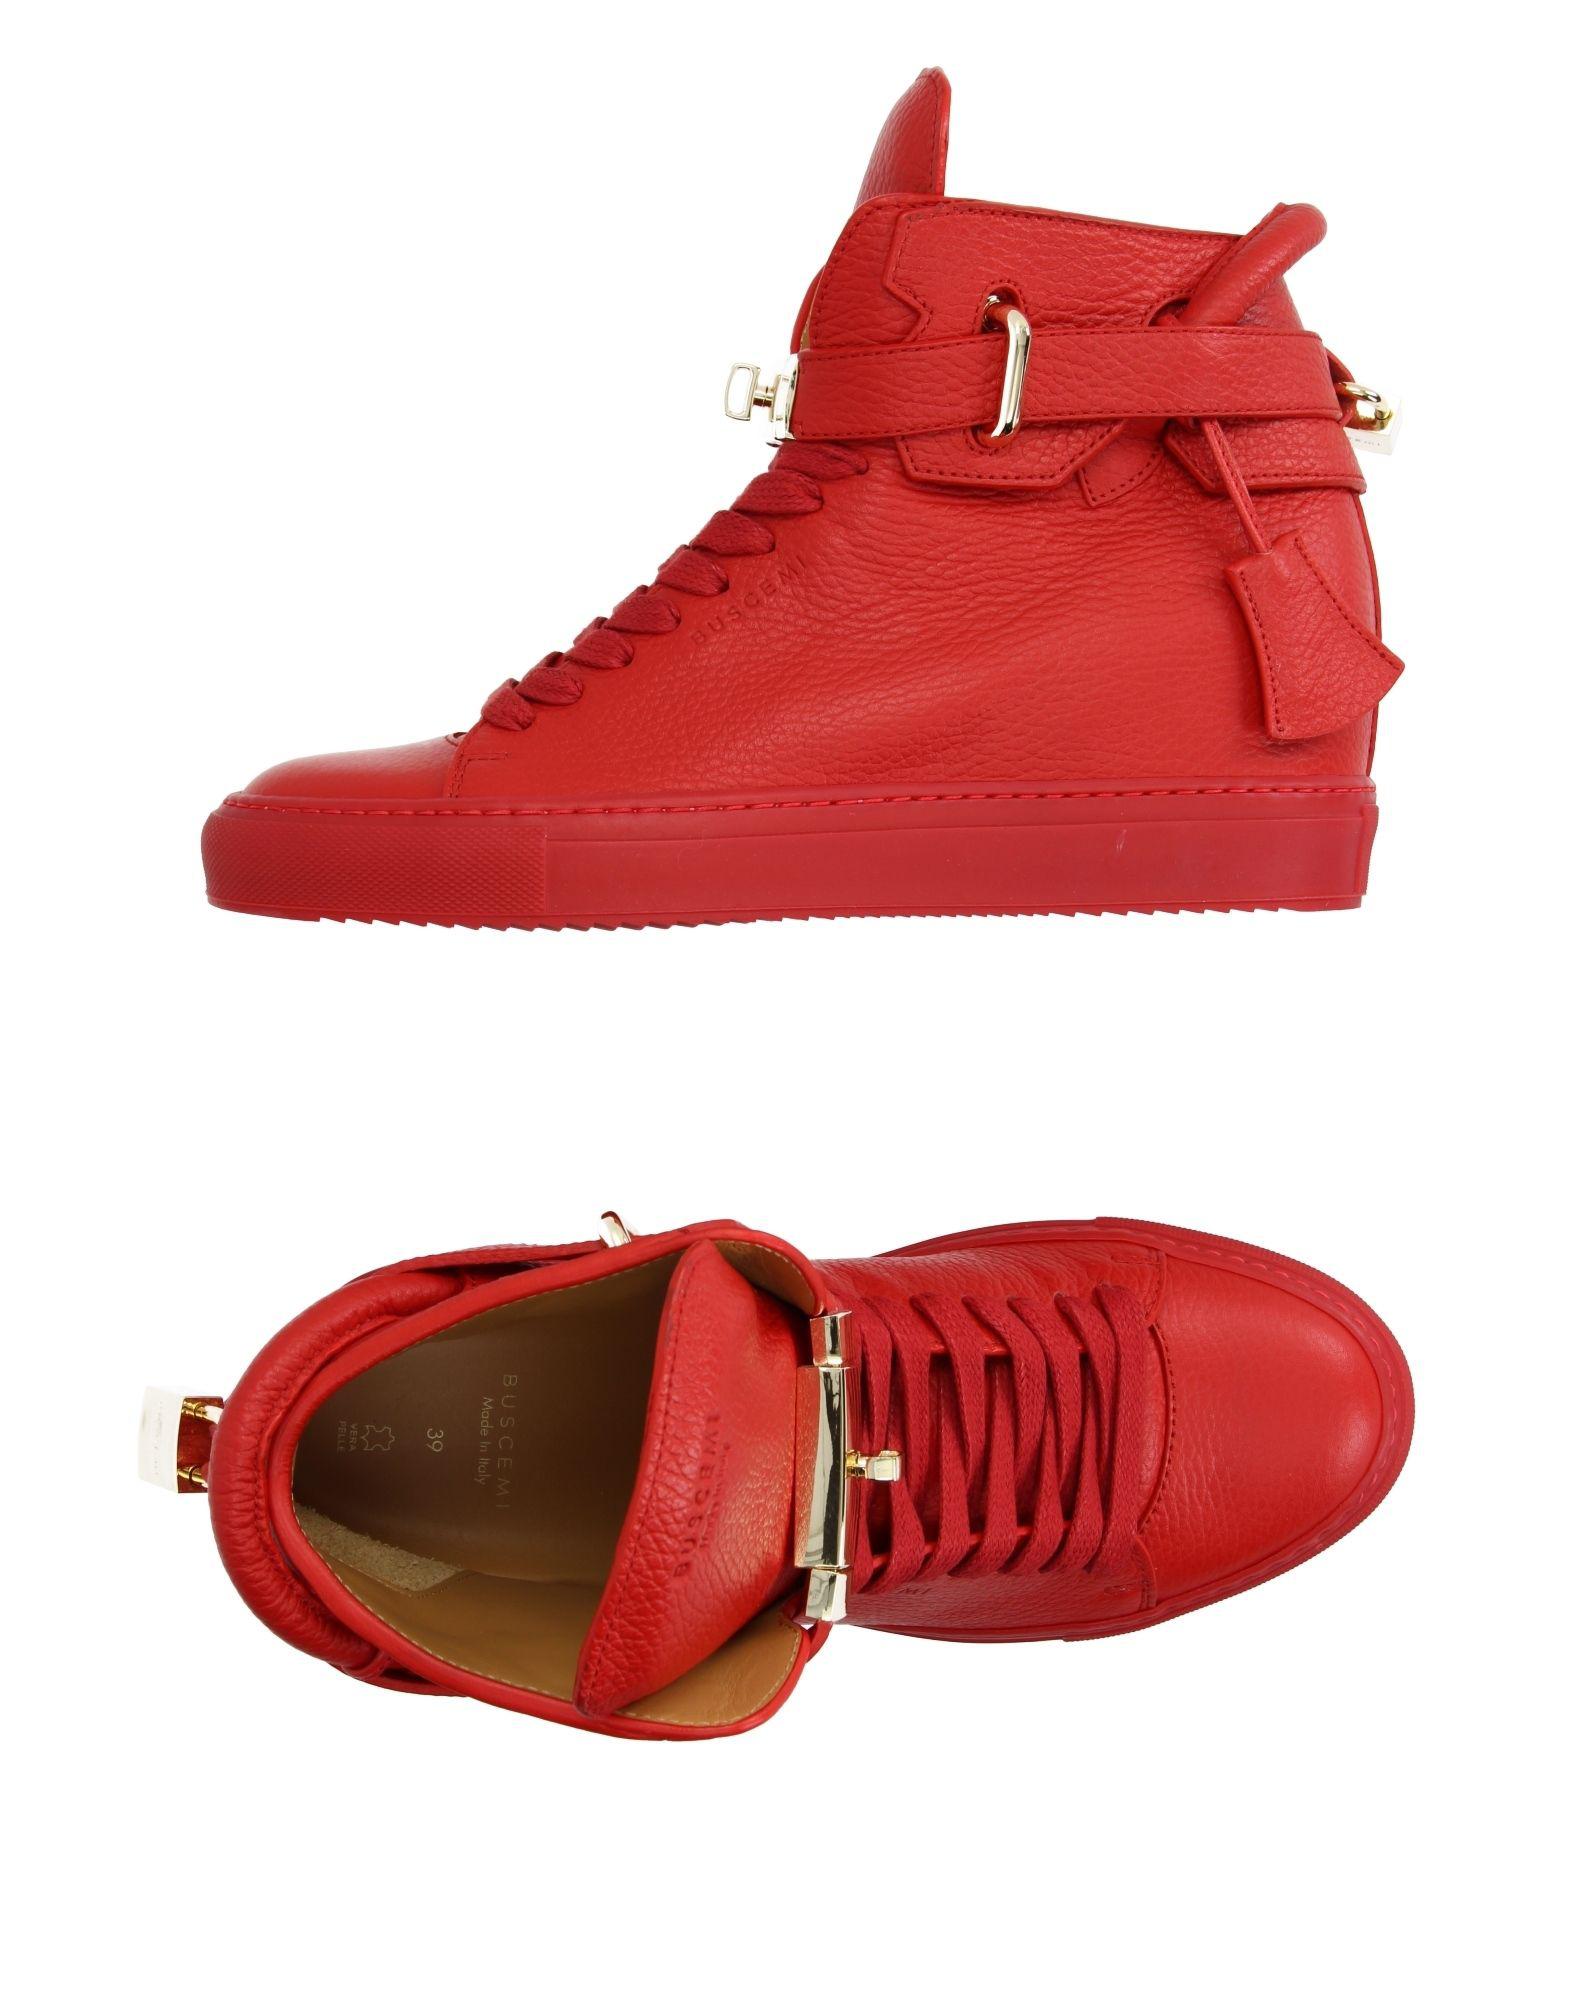 bdebc6b23b9 BUSCEMI. Alta Leather Wedge High Top Sneakers